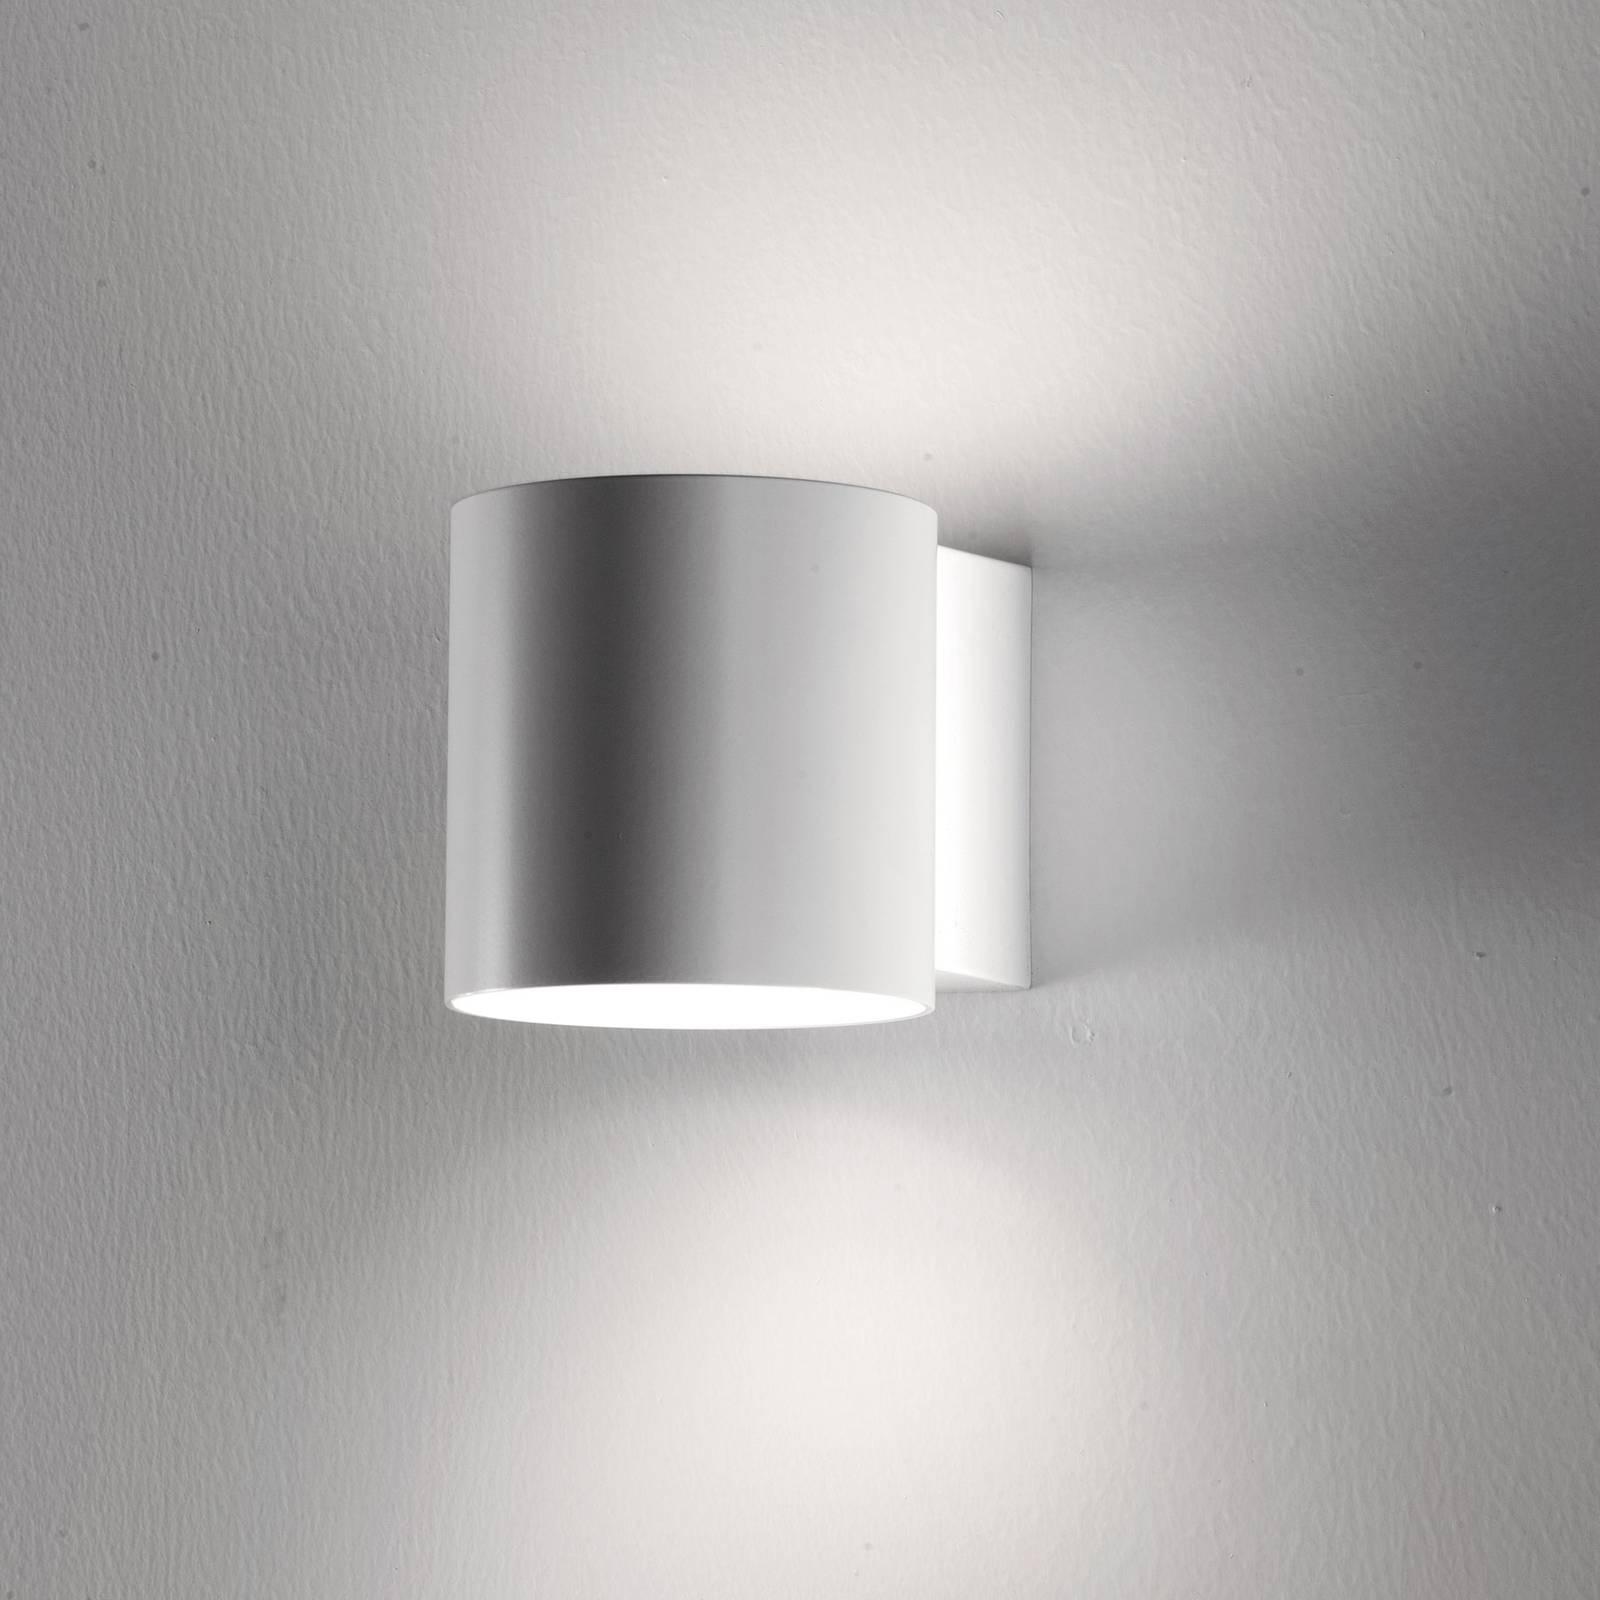 Martinelli Luce Tube -seinälamppu, metalli, 14 cm